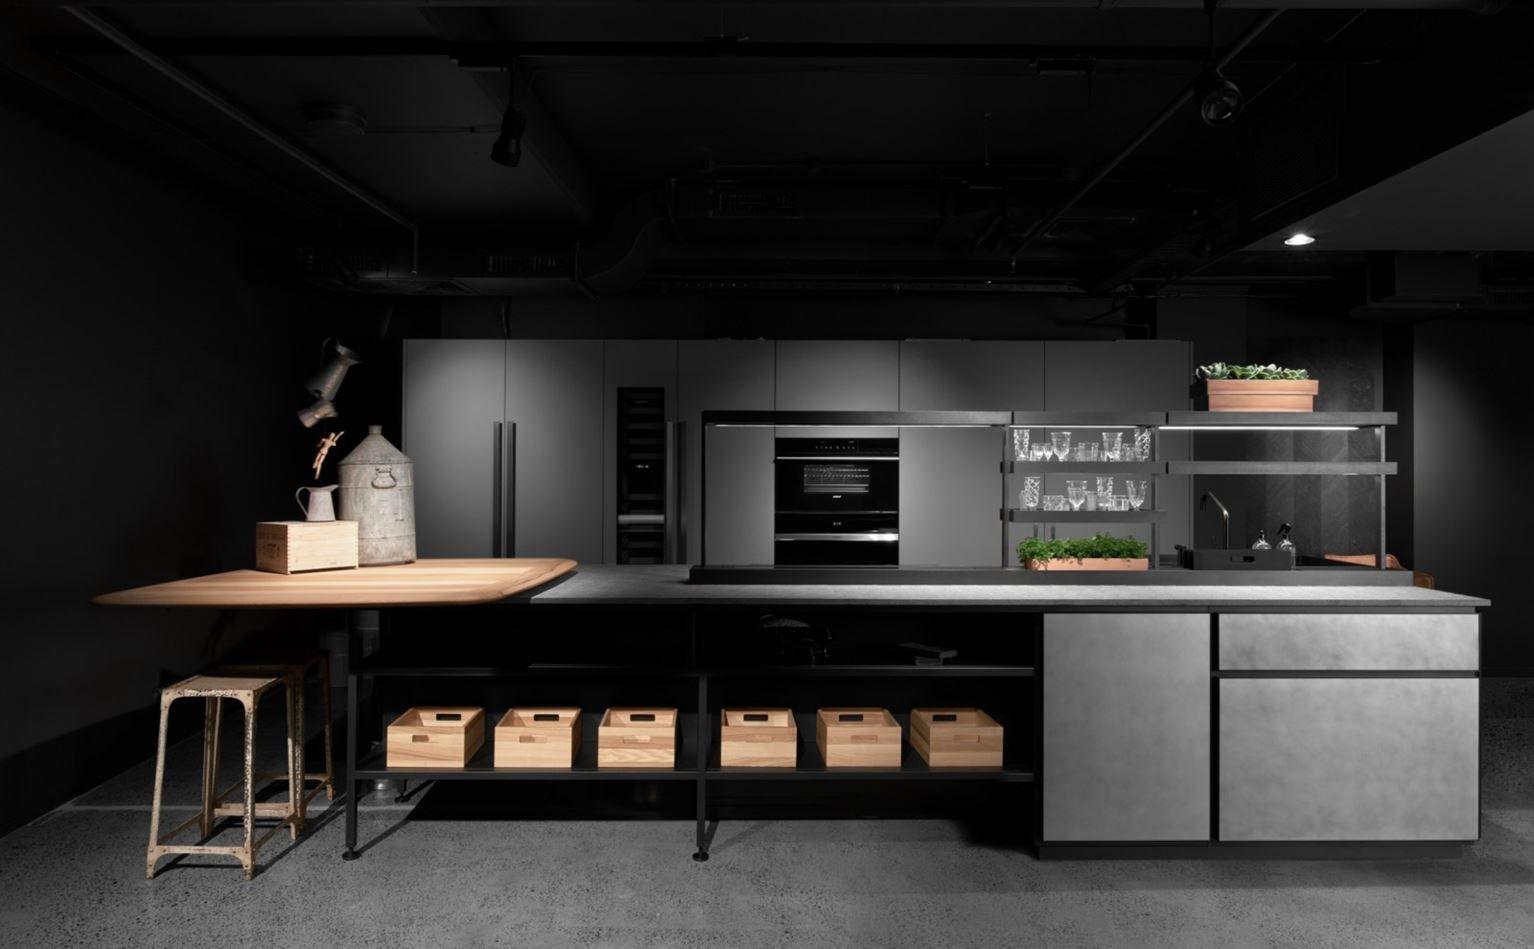 Boffi Studio Sydney - Picture gallery | Casa arjorcri | Pinterest